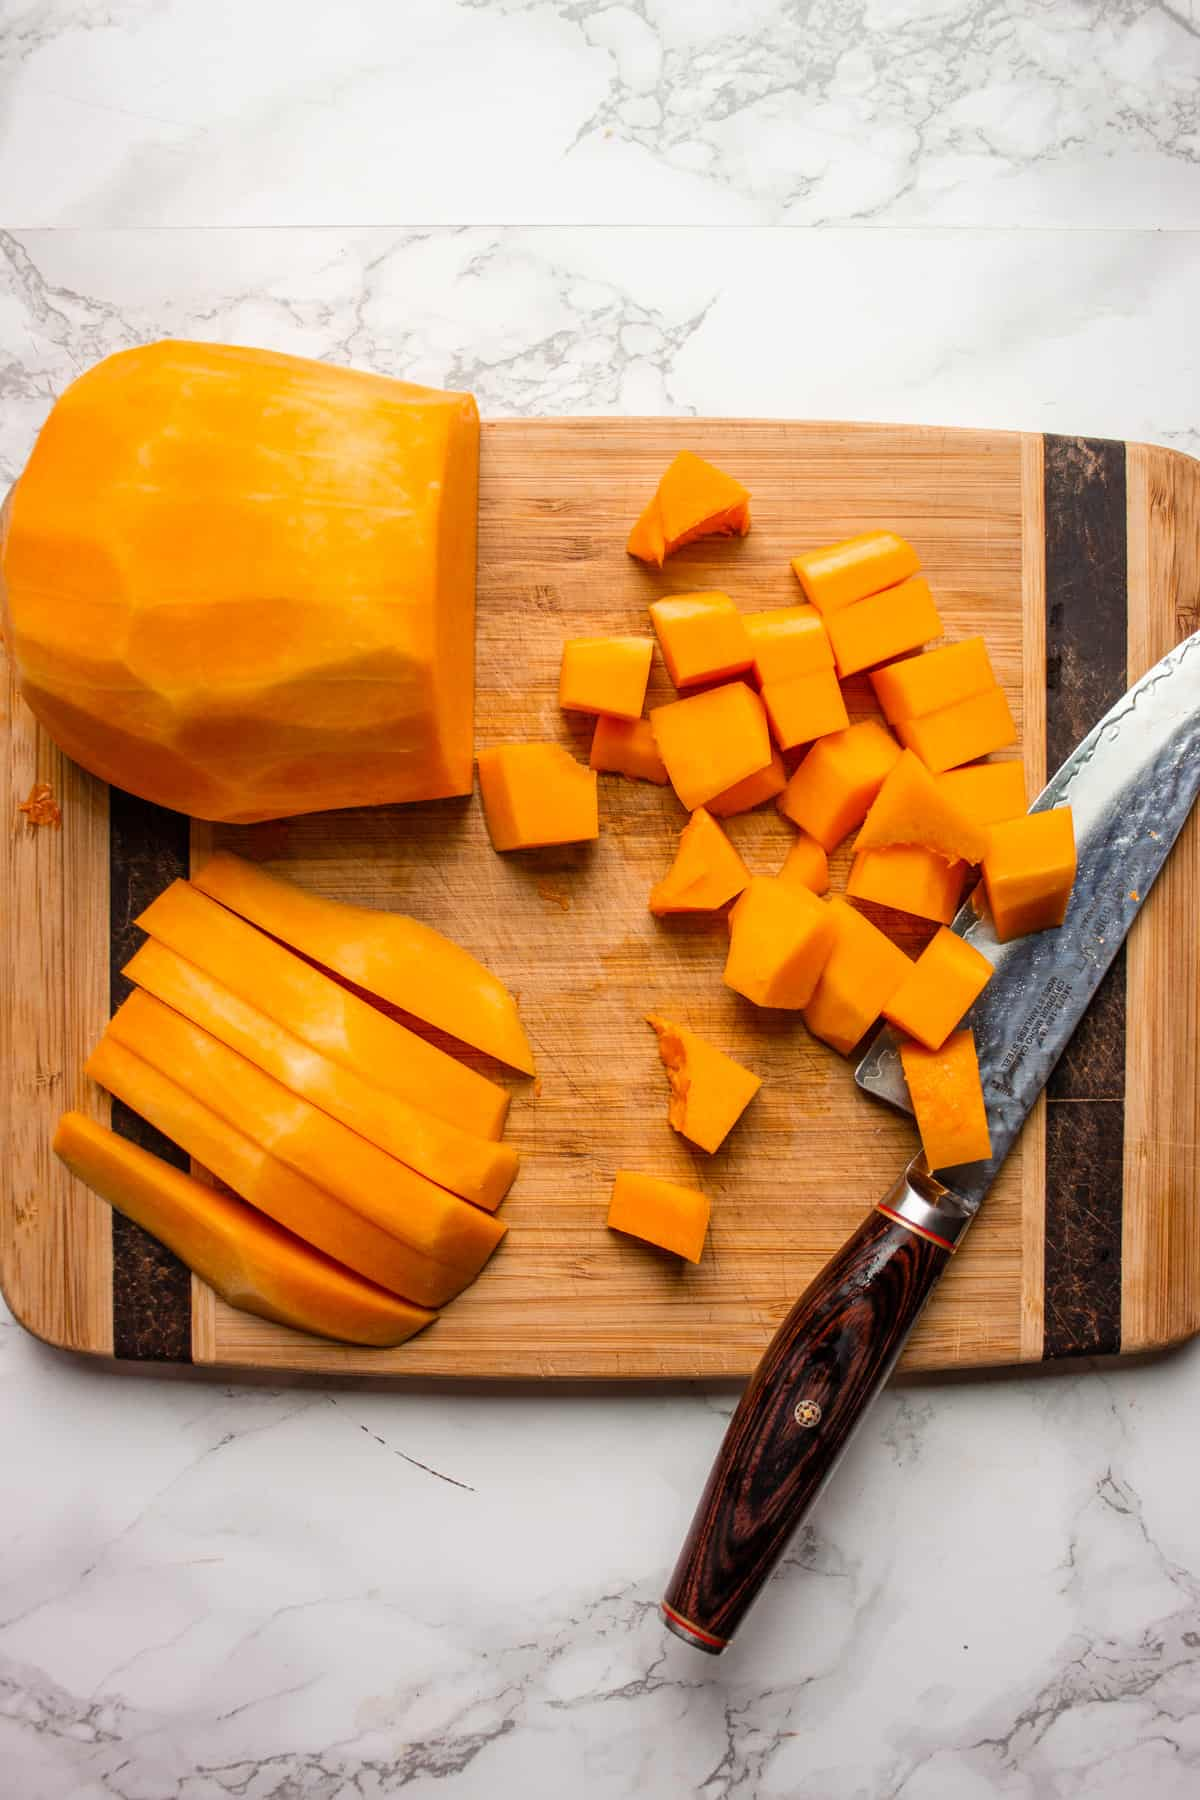 Chopping butternut squash on a chopping board